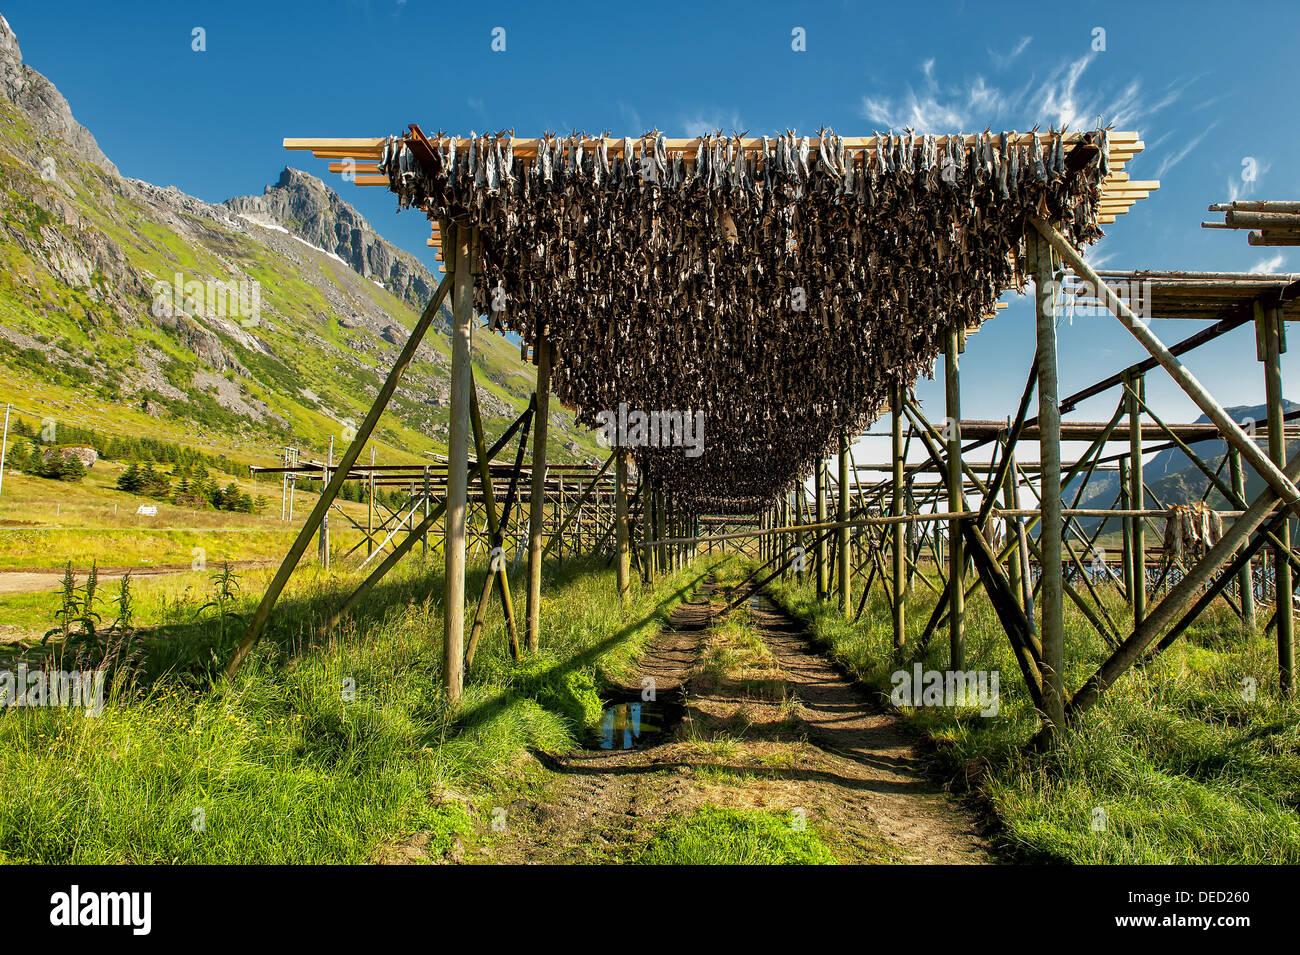 Stockfish drying at Lofoten in northern Norway - Stock Image